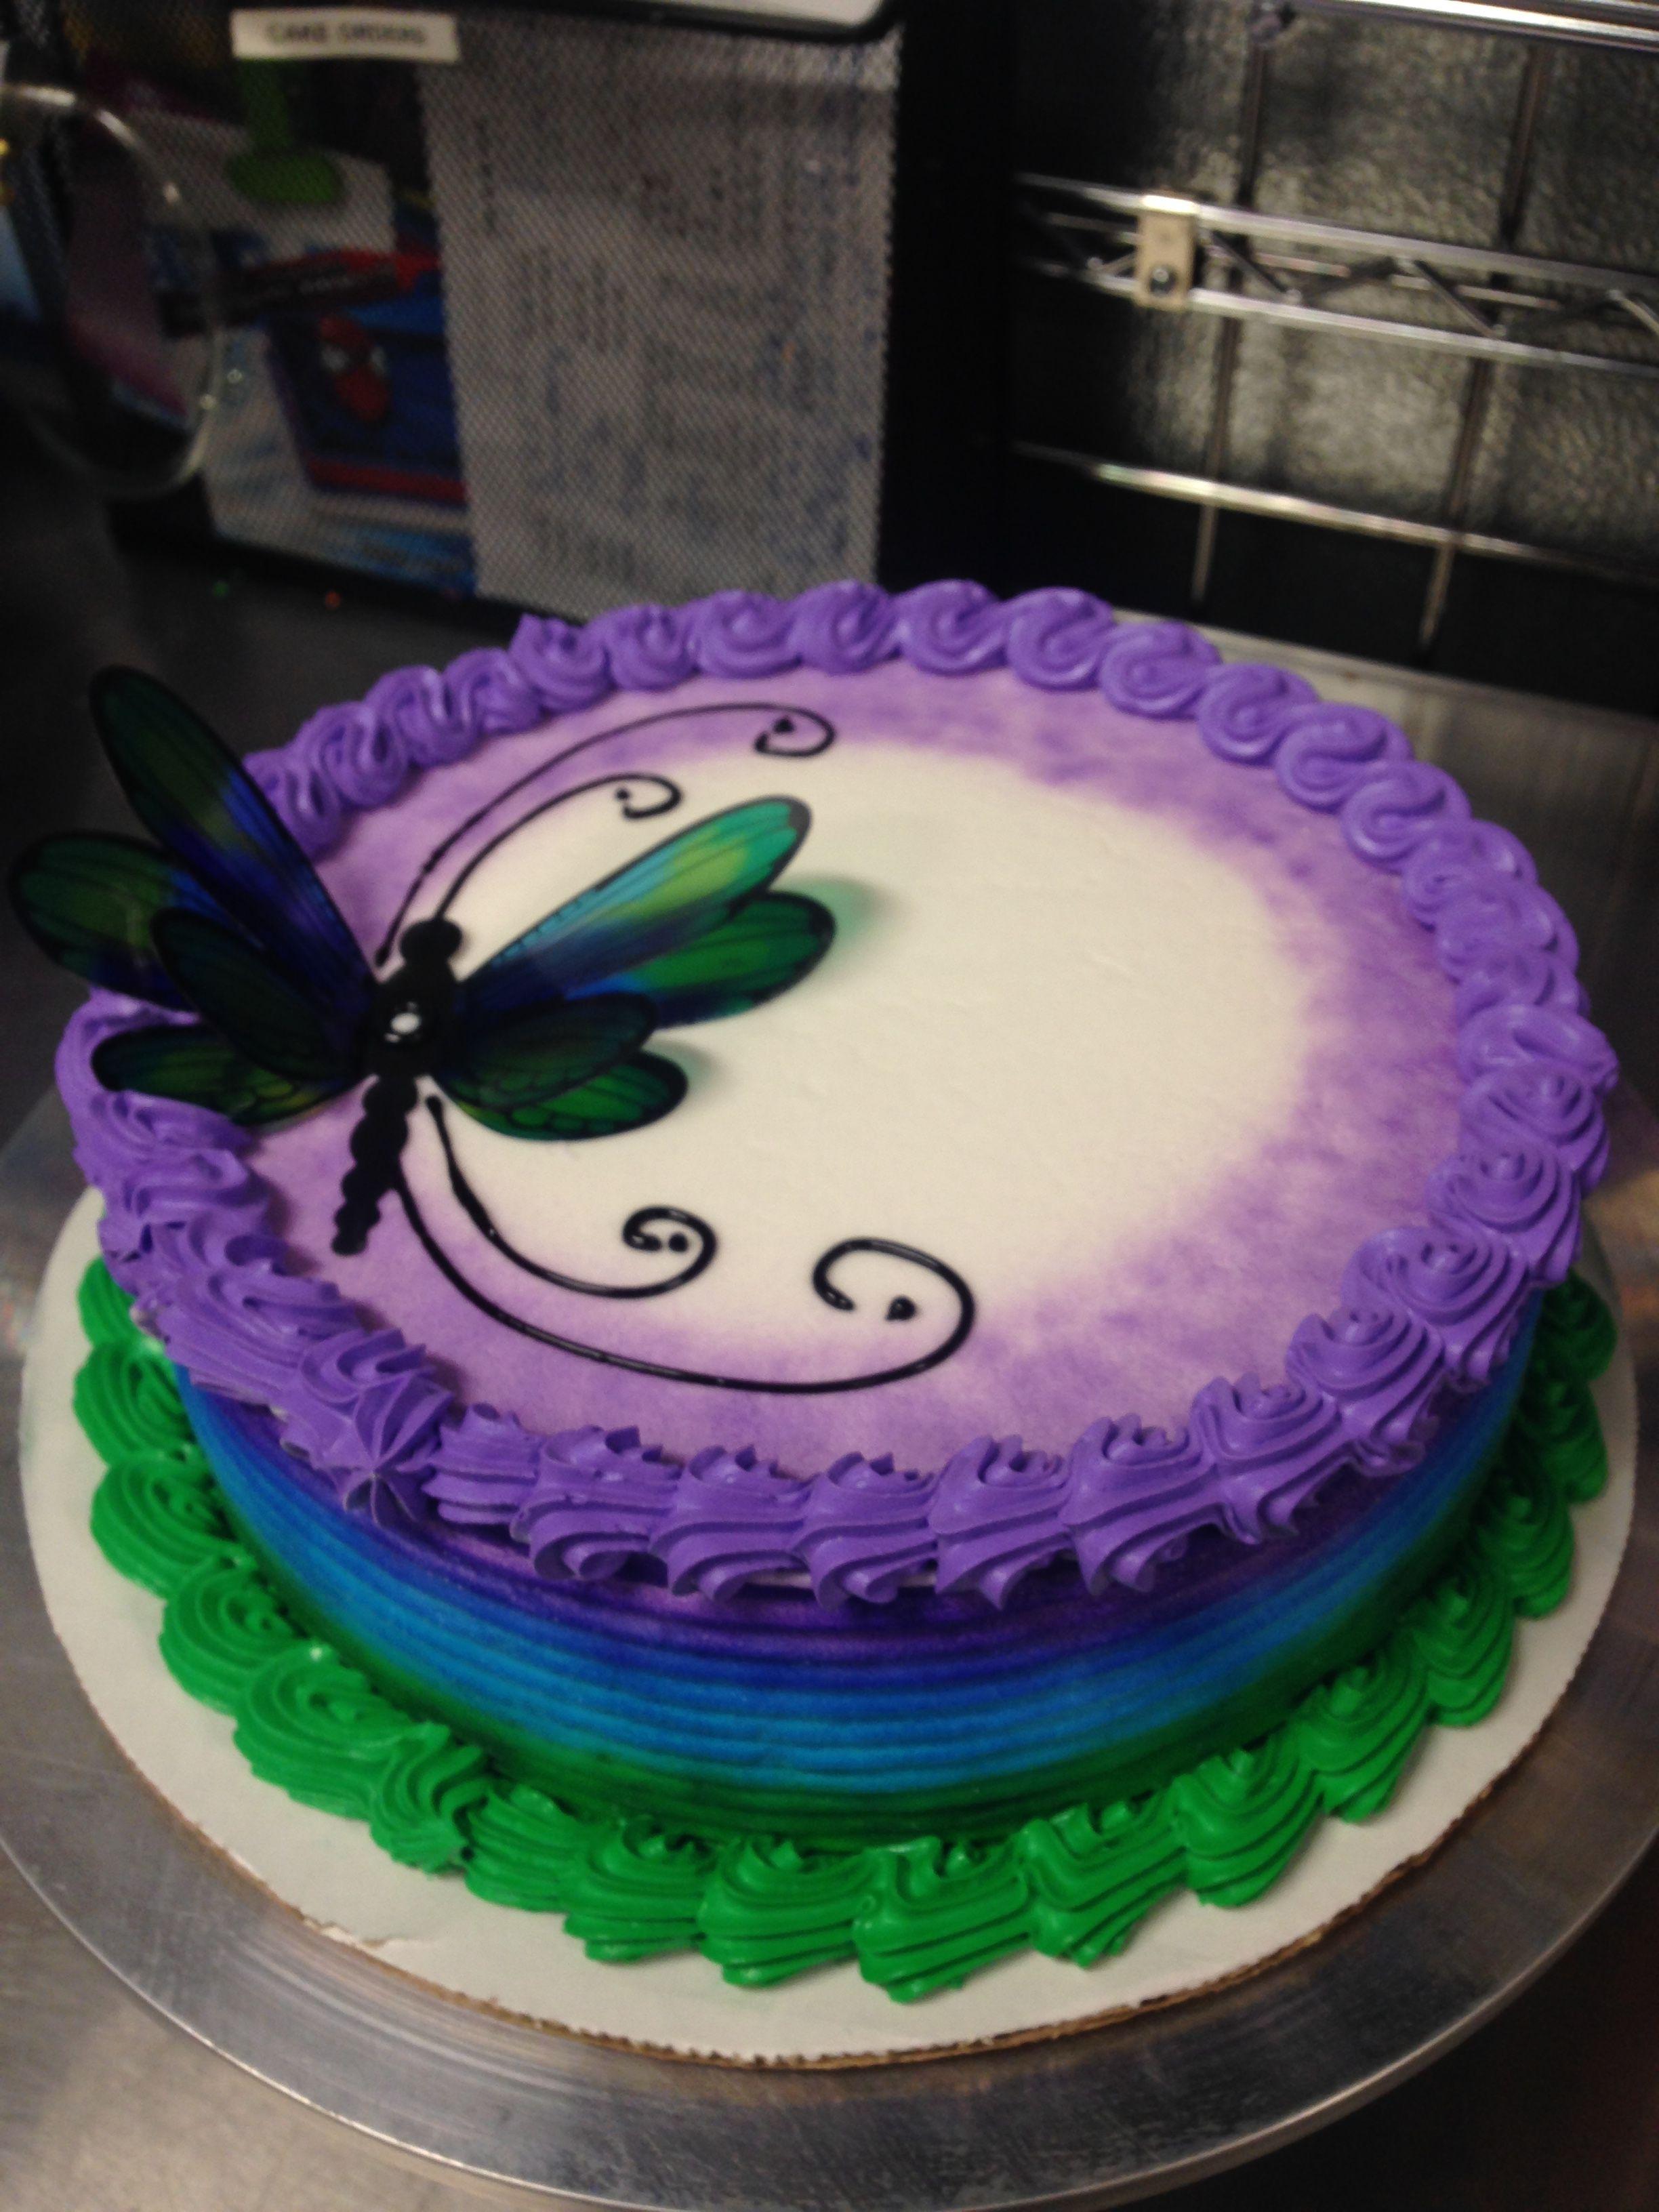 Dq ice cream cake with dragonfly cake cake decorating